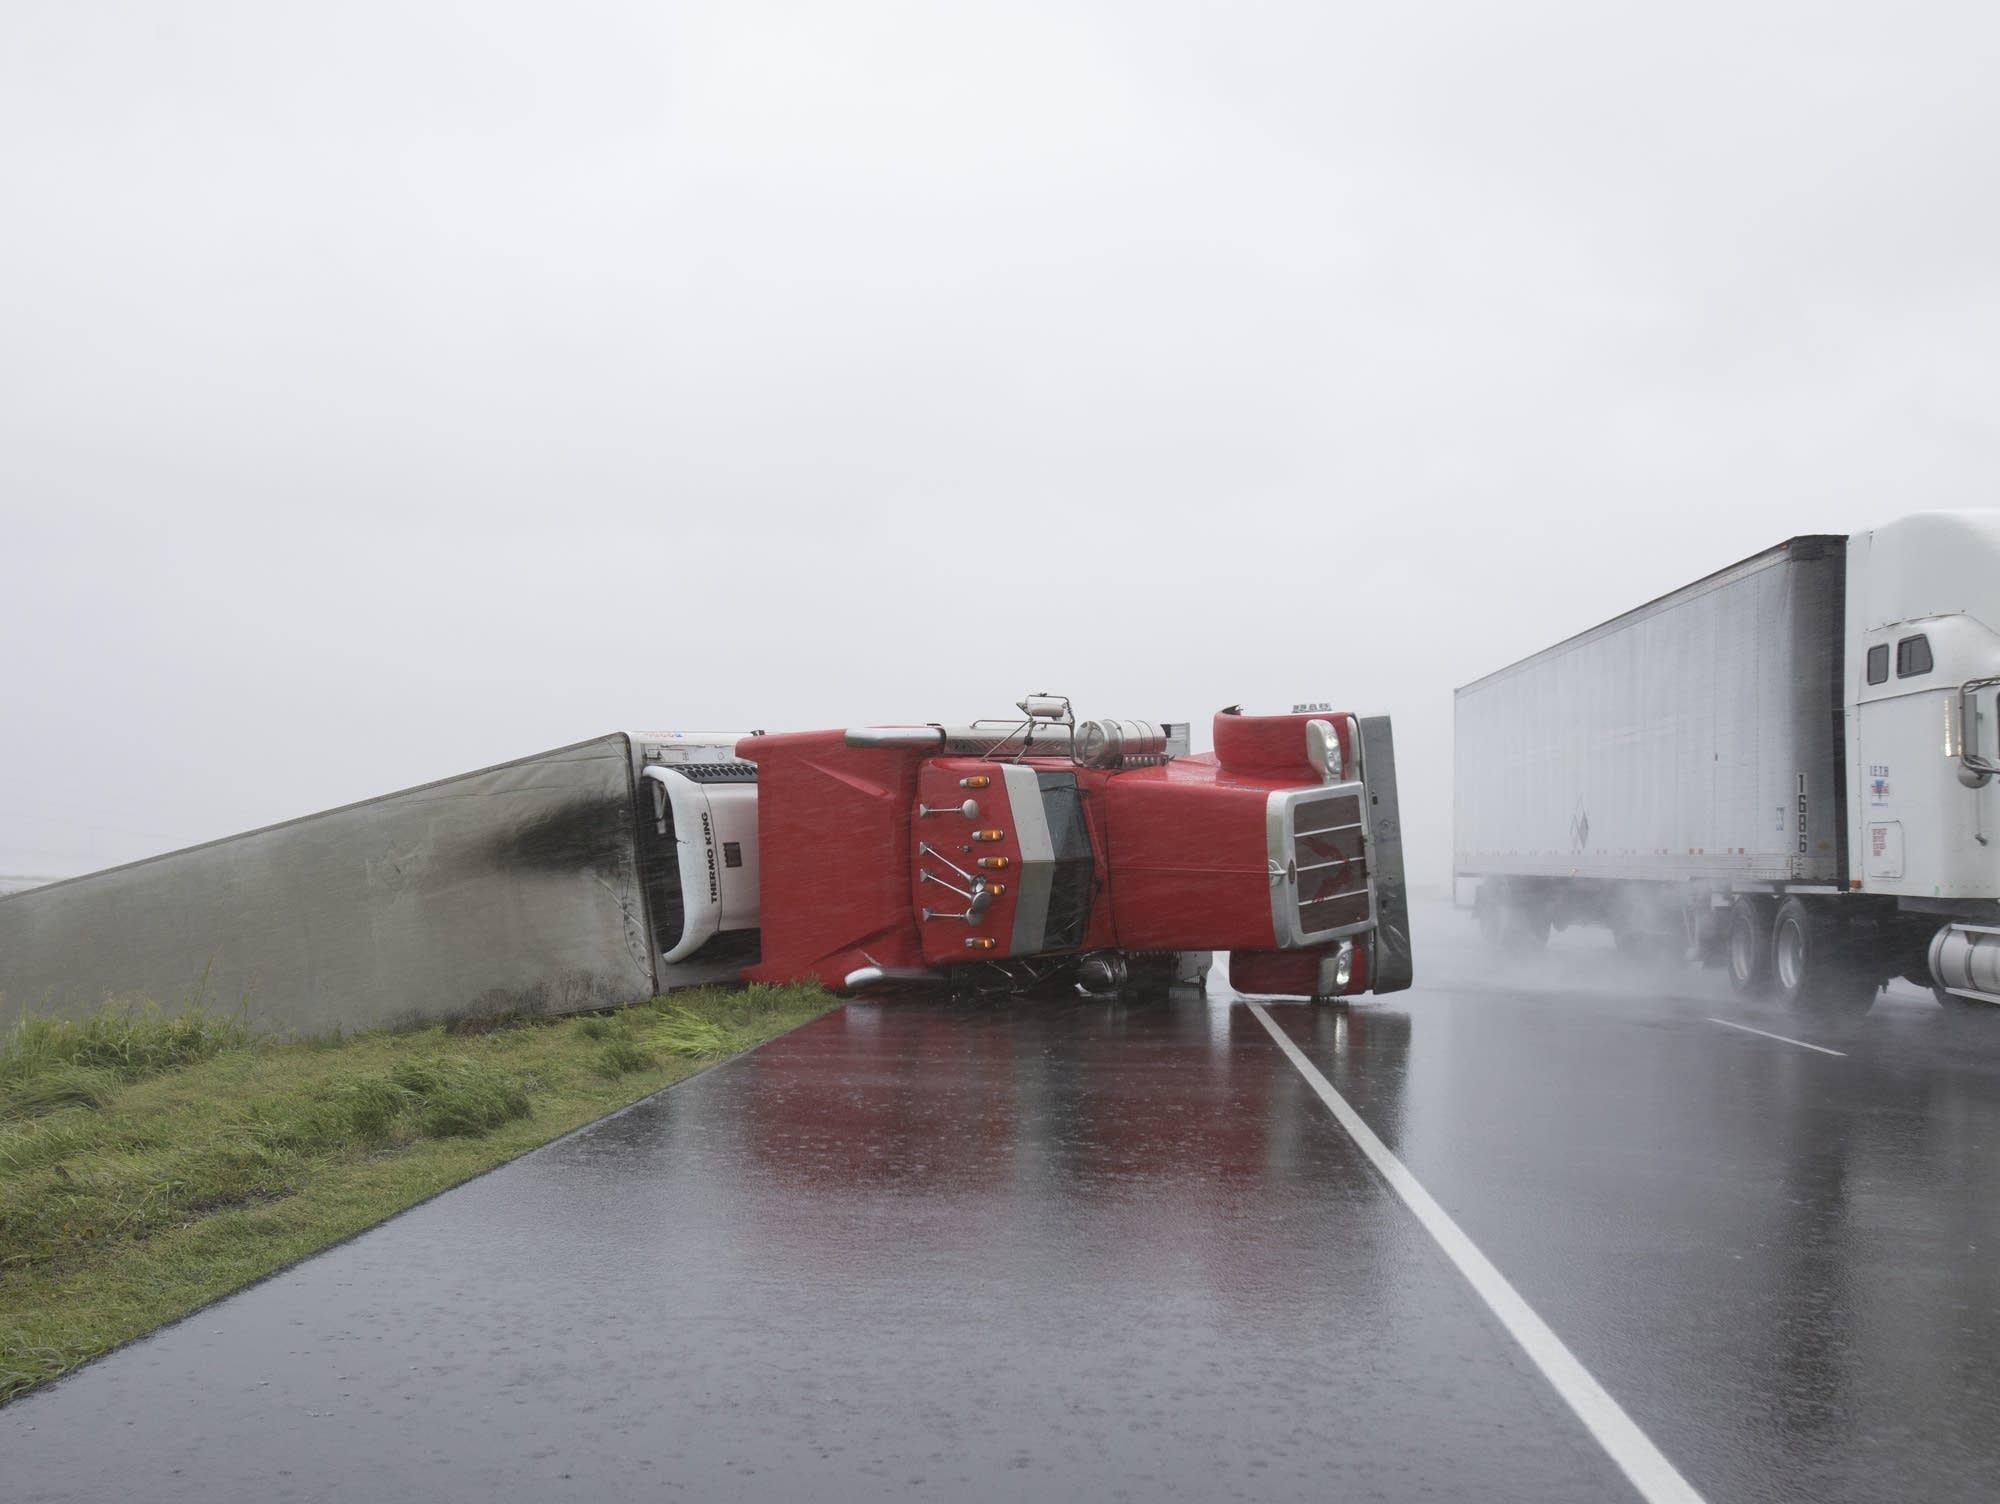 A big rig lies on it's side on Hwy 59 near Edna, Texas